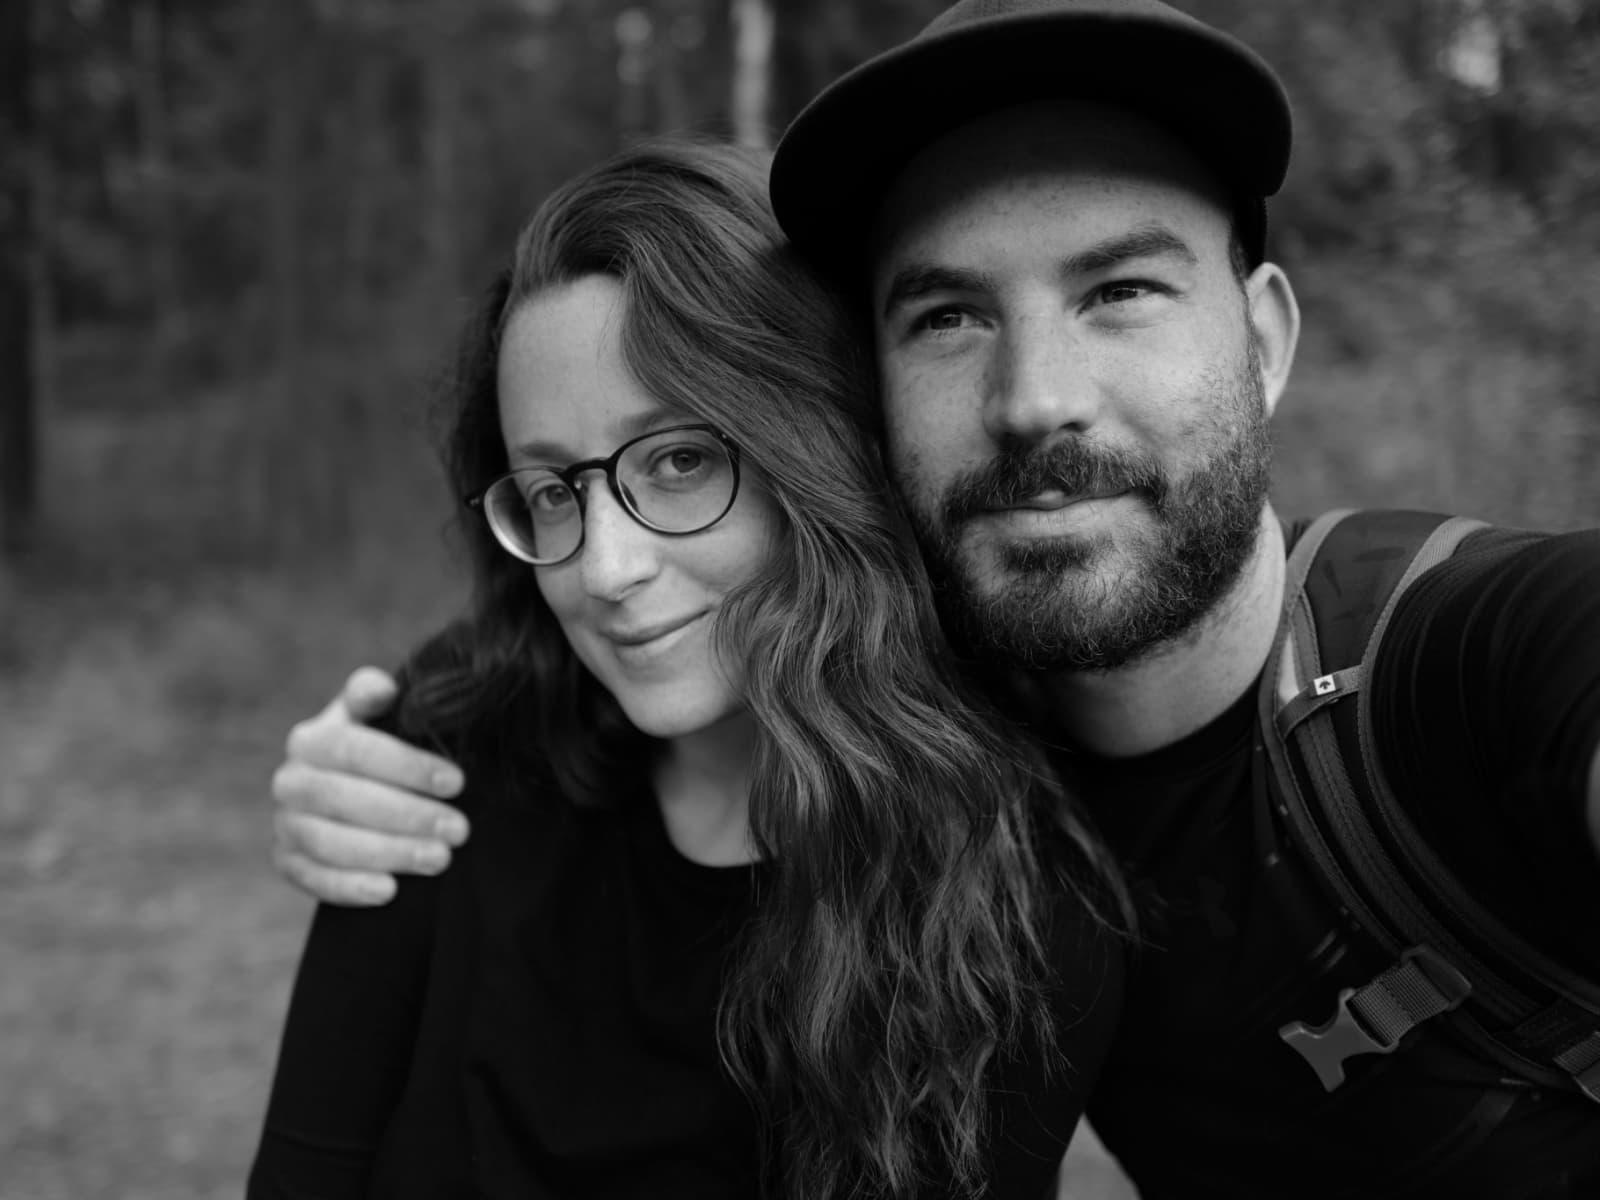 Sarra & Marco from Basel, Switzerland